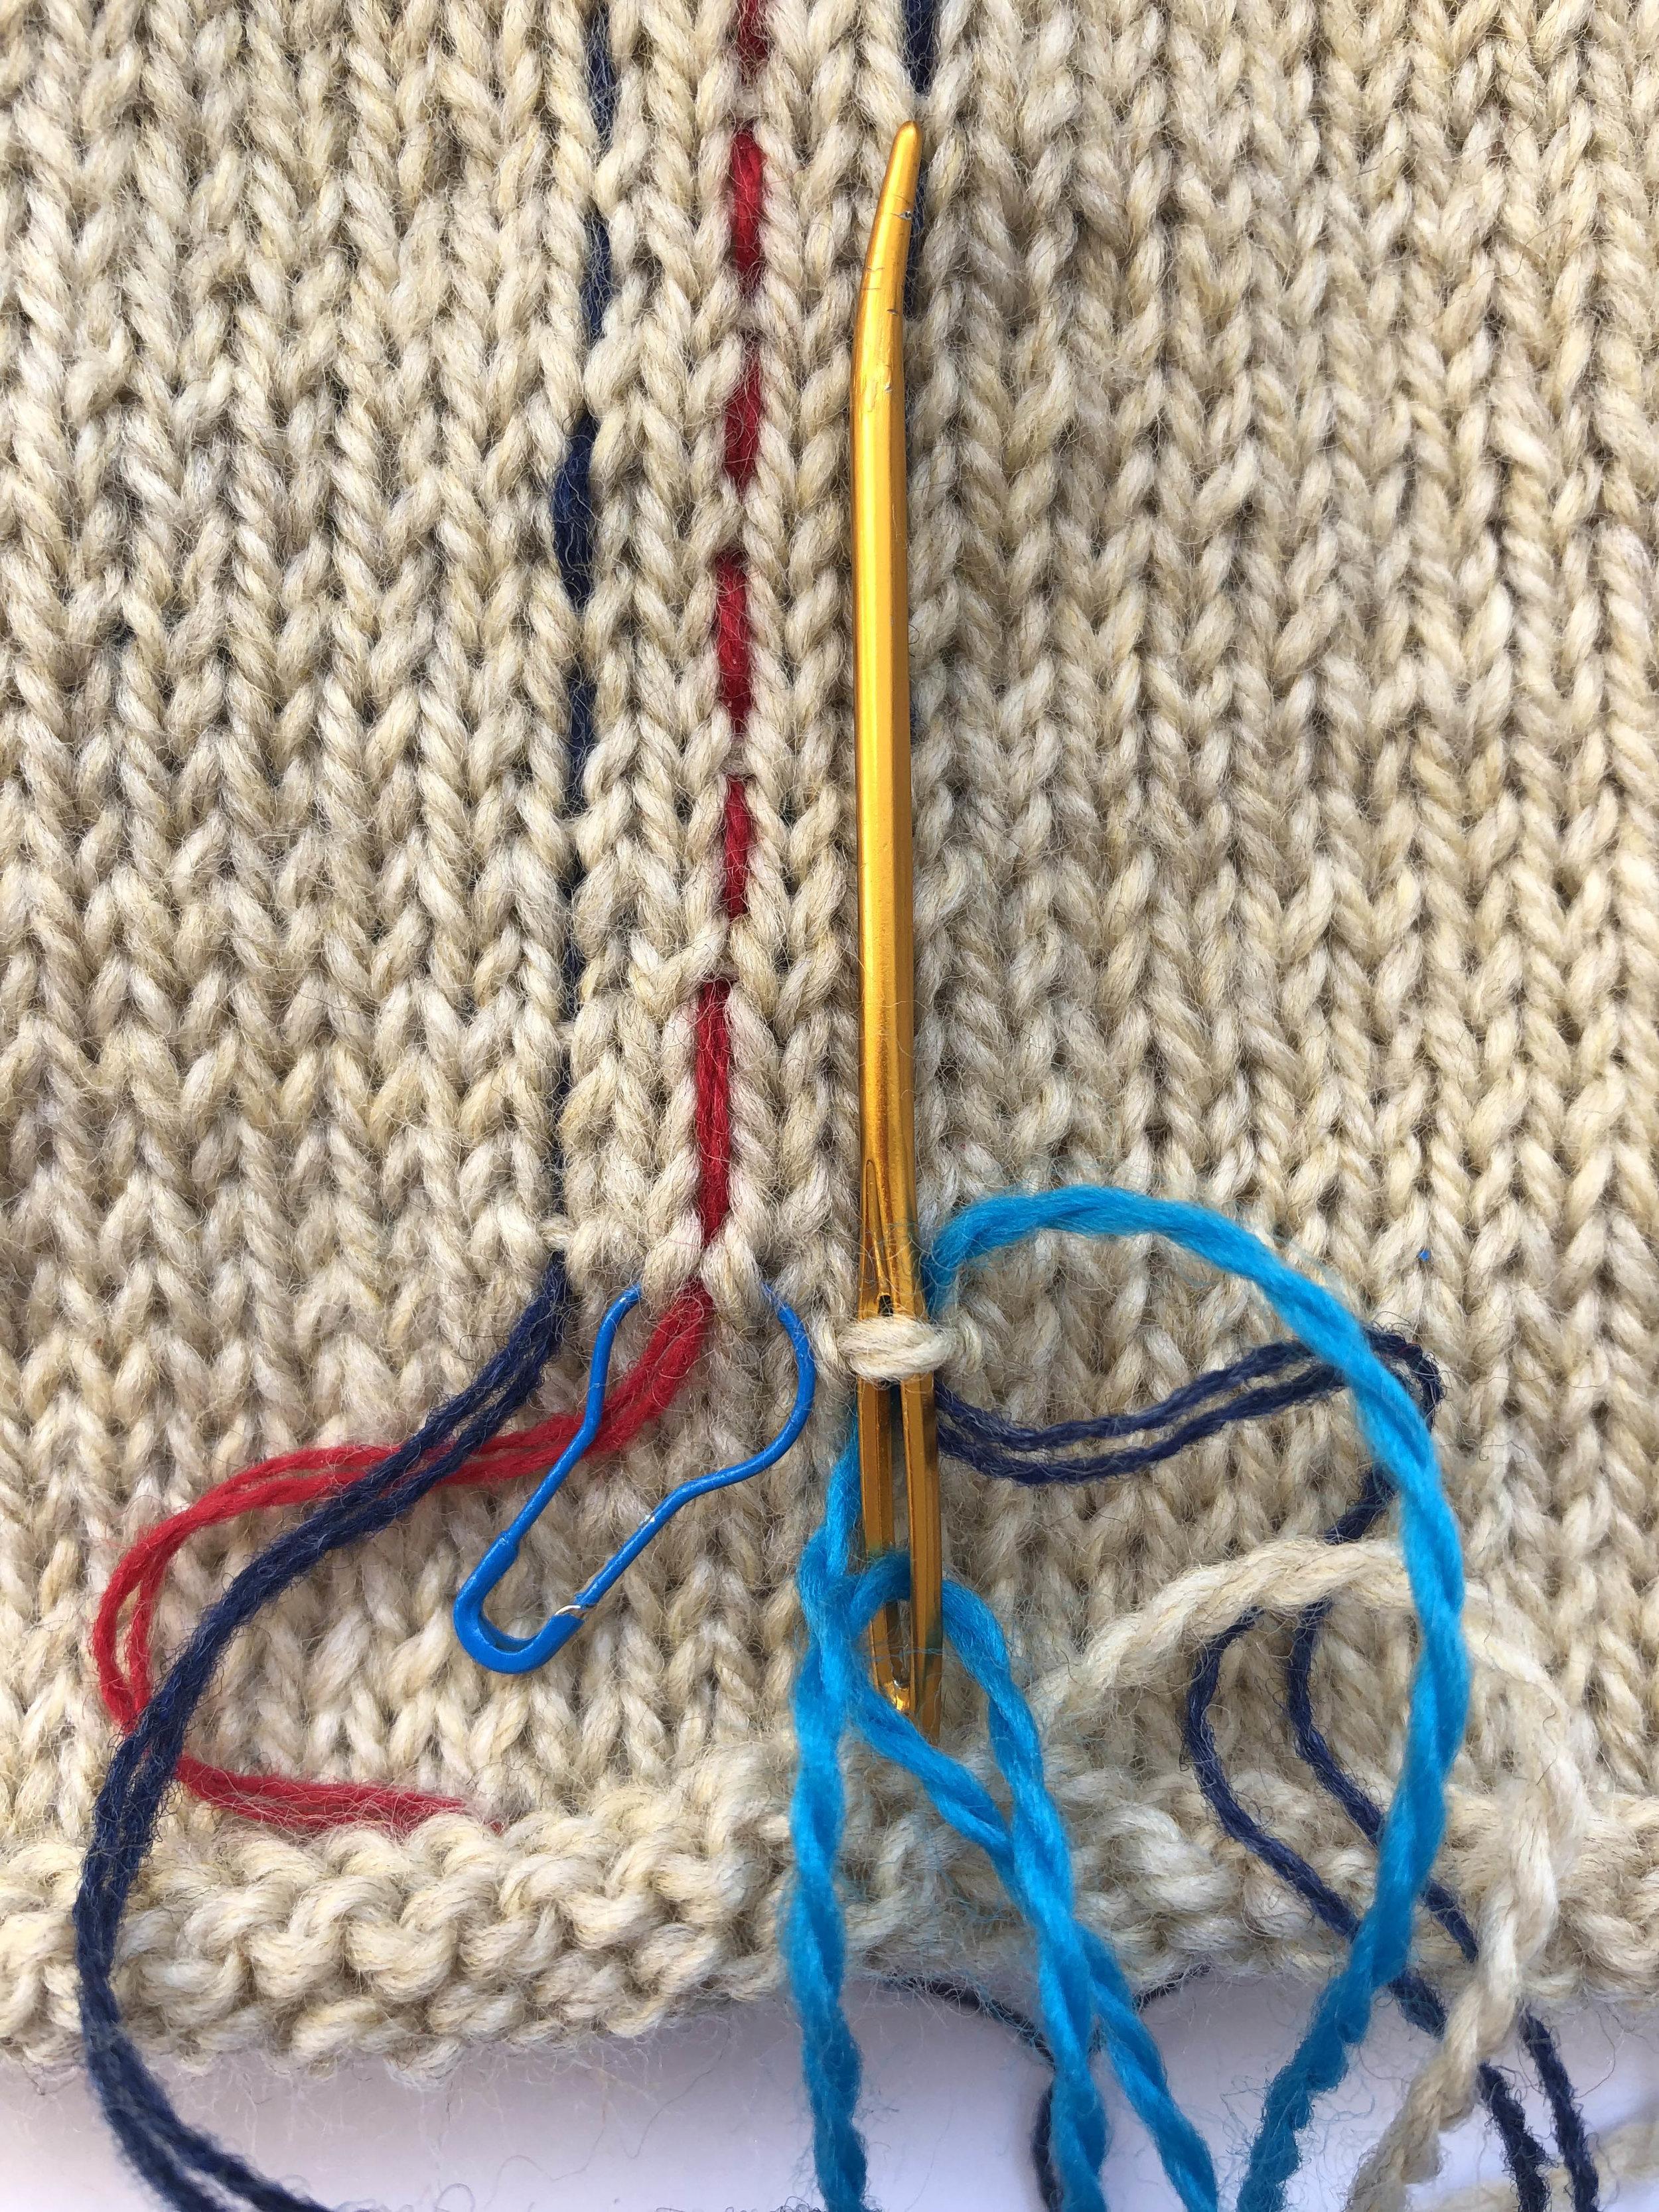 merele back stitch steek 3.jpg